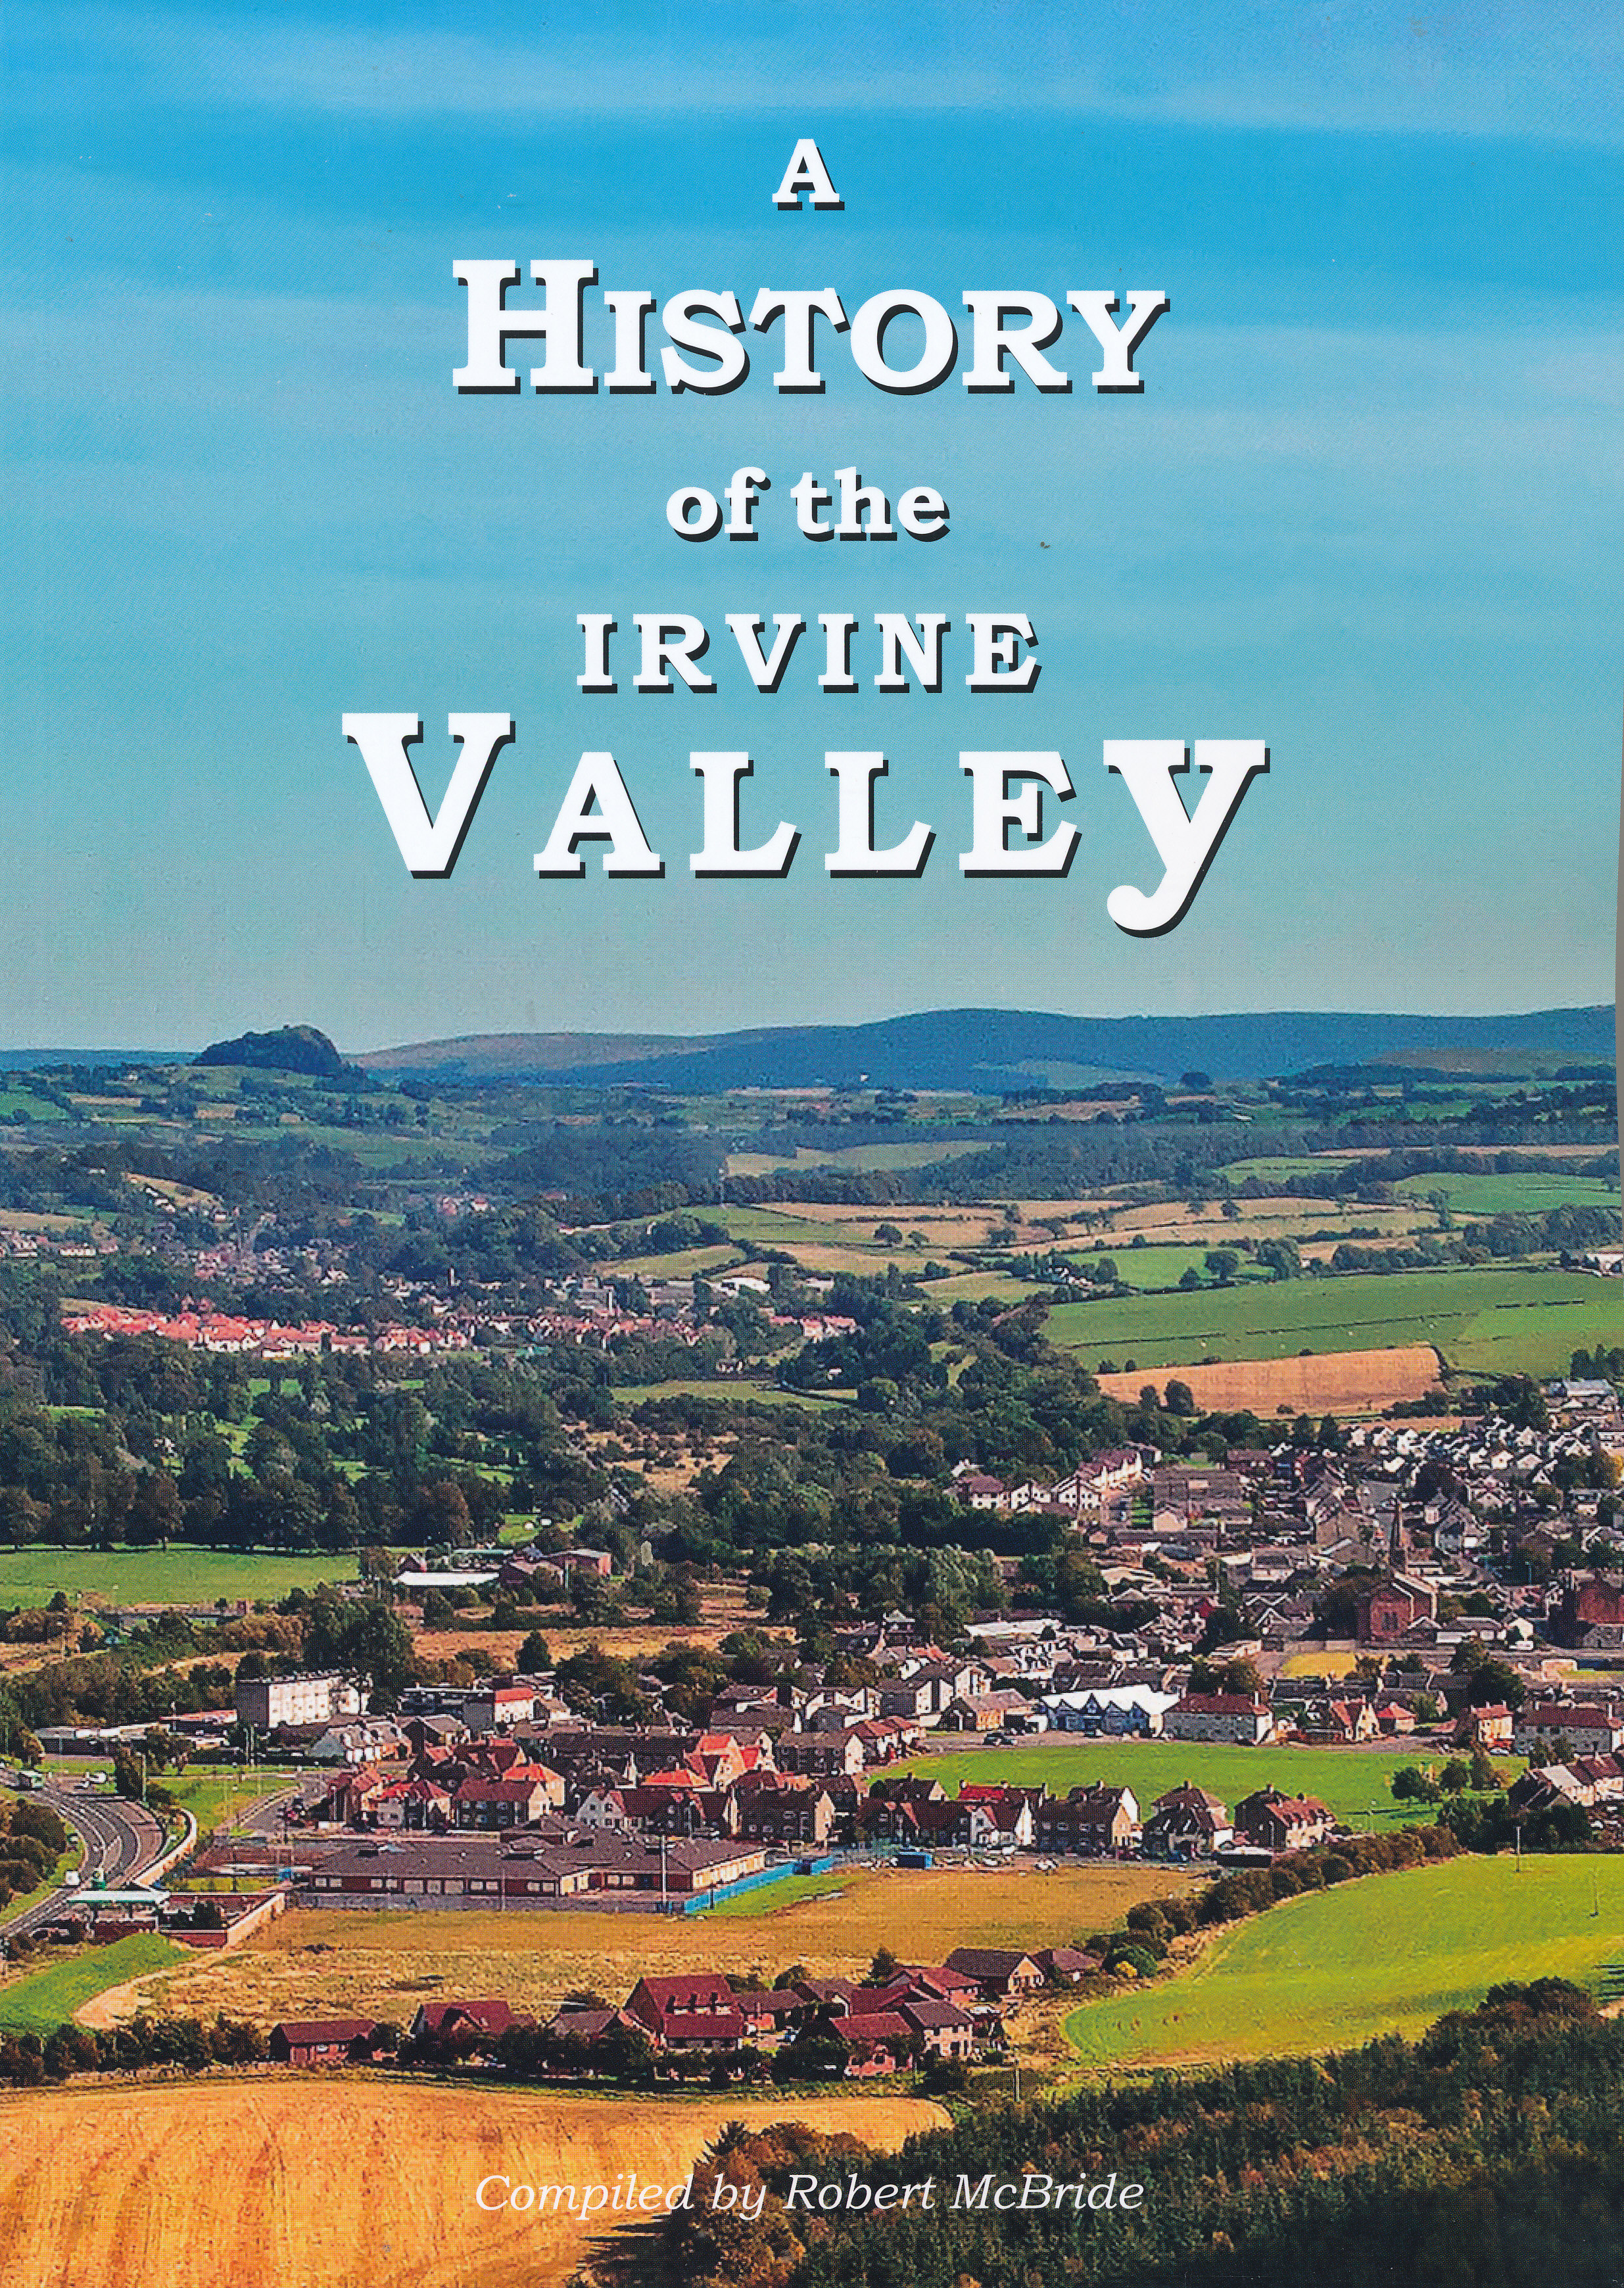 HistoryIrvineValley01